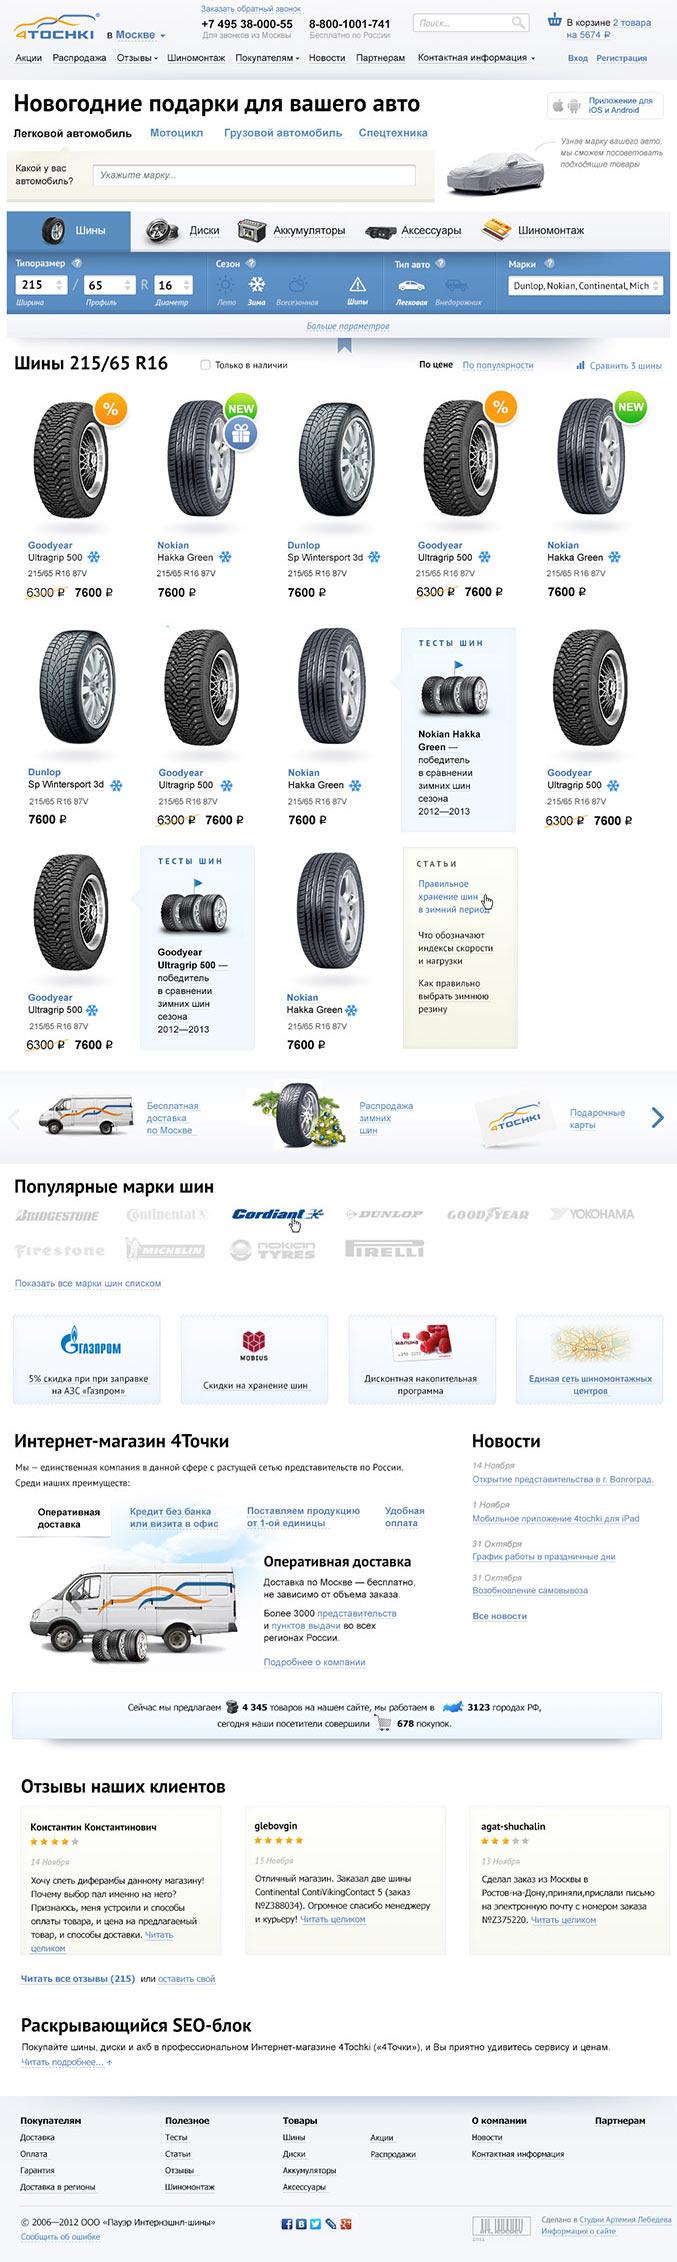 Уроки Русского Языка Онлайн  urokirus